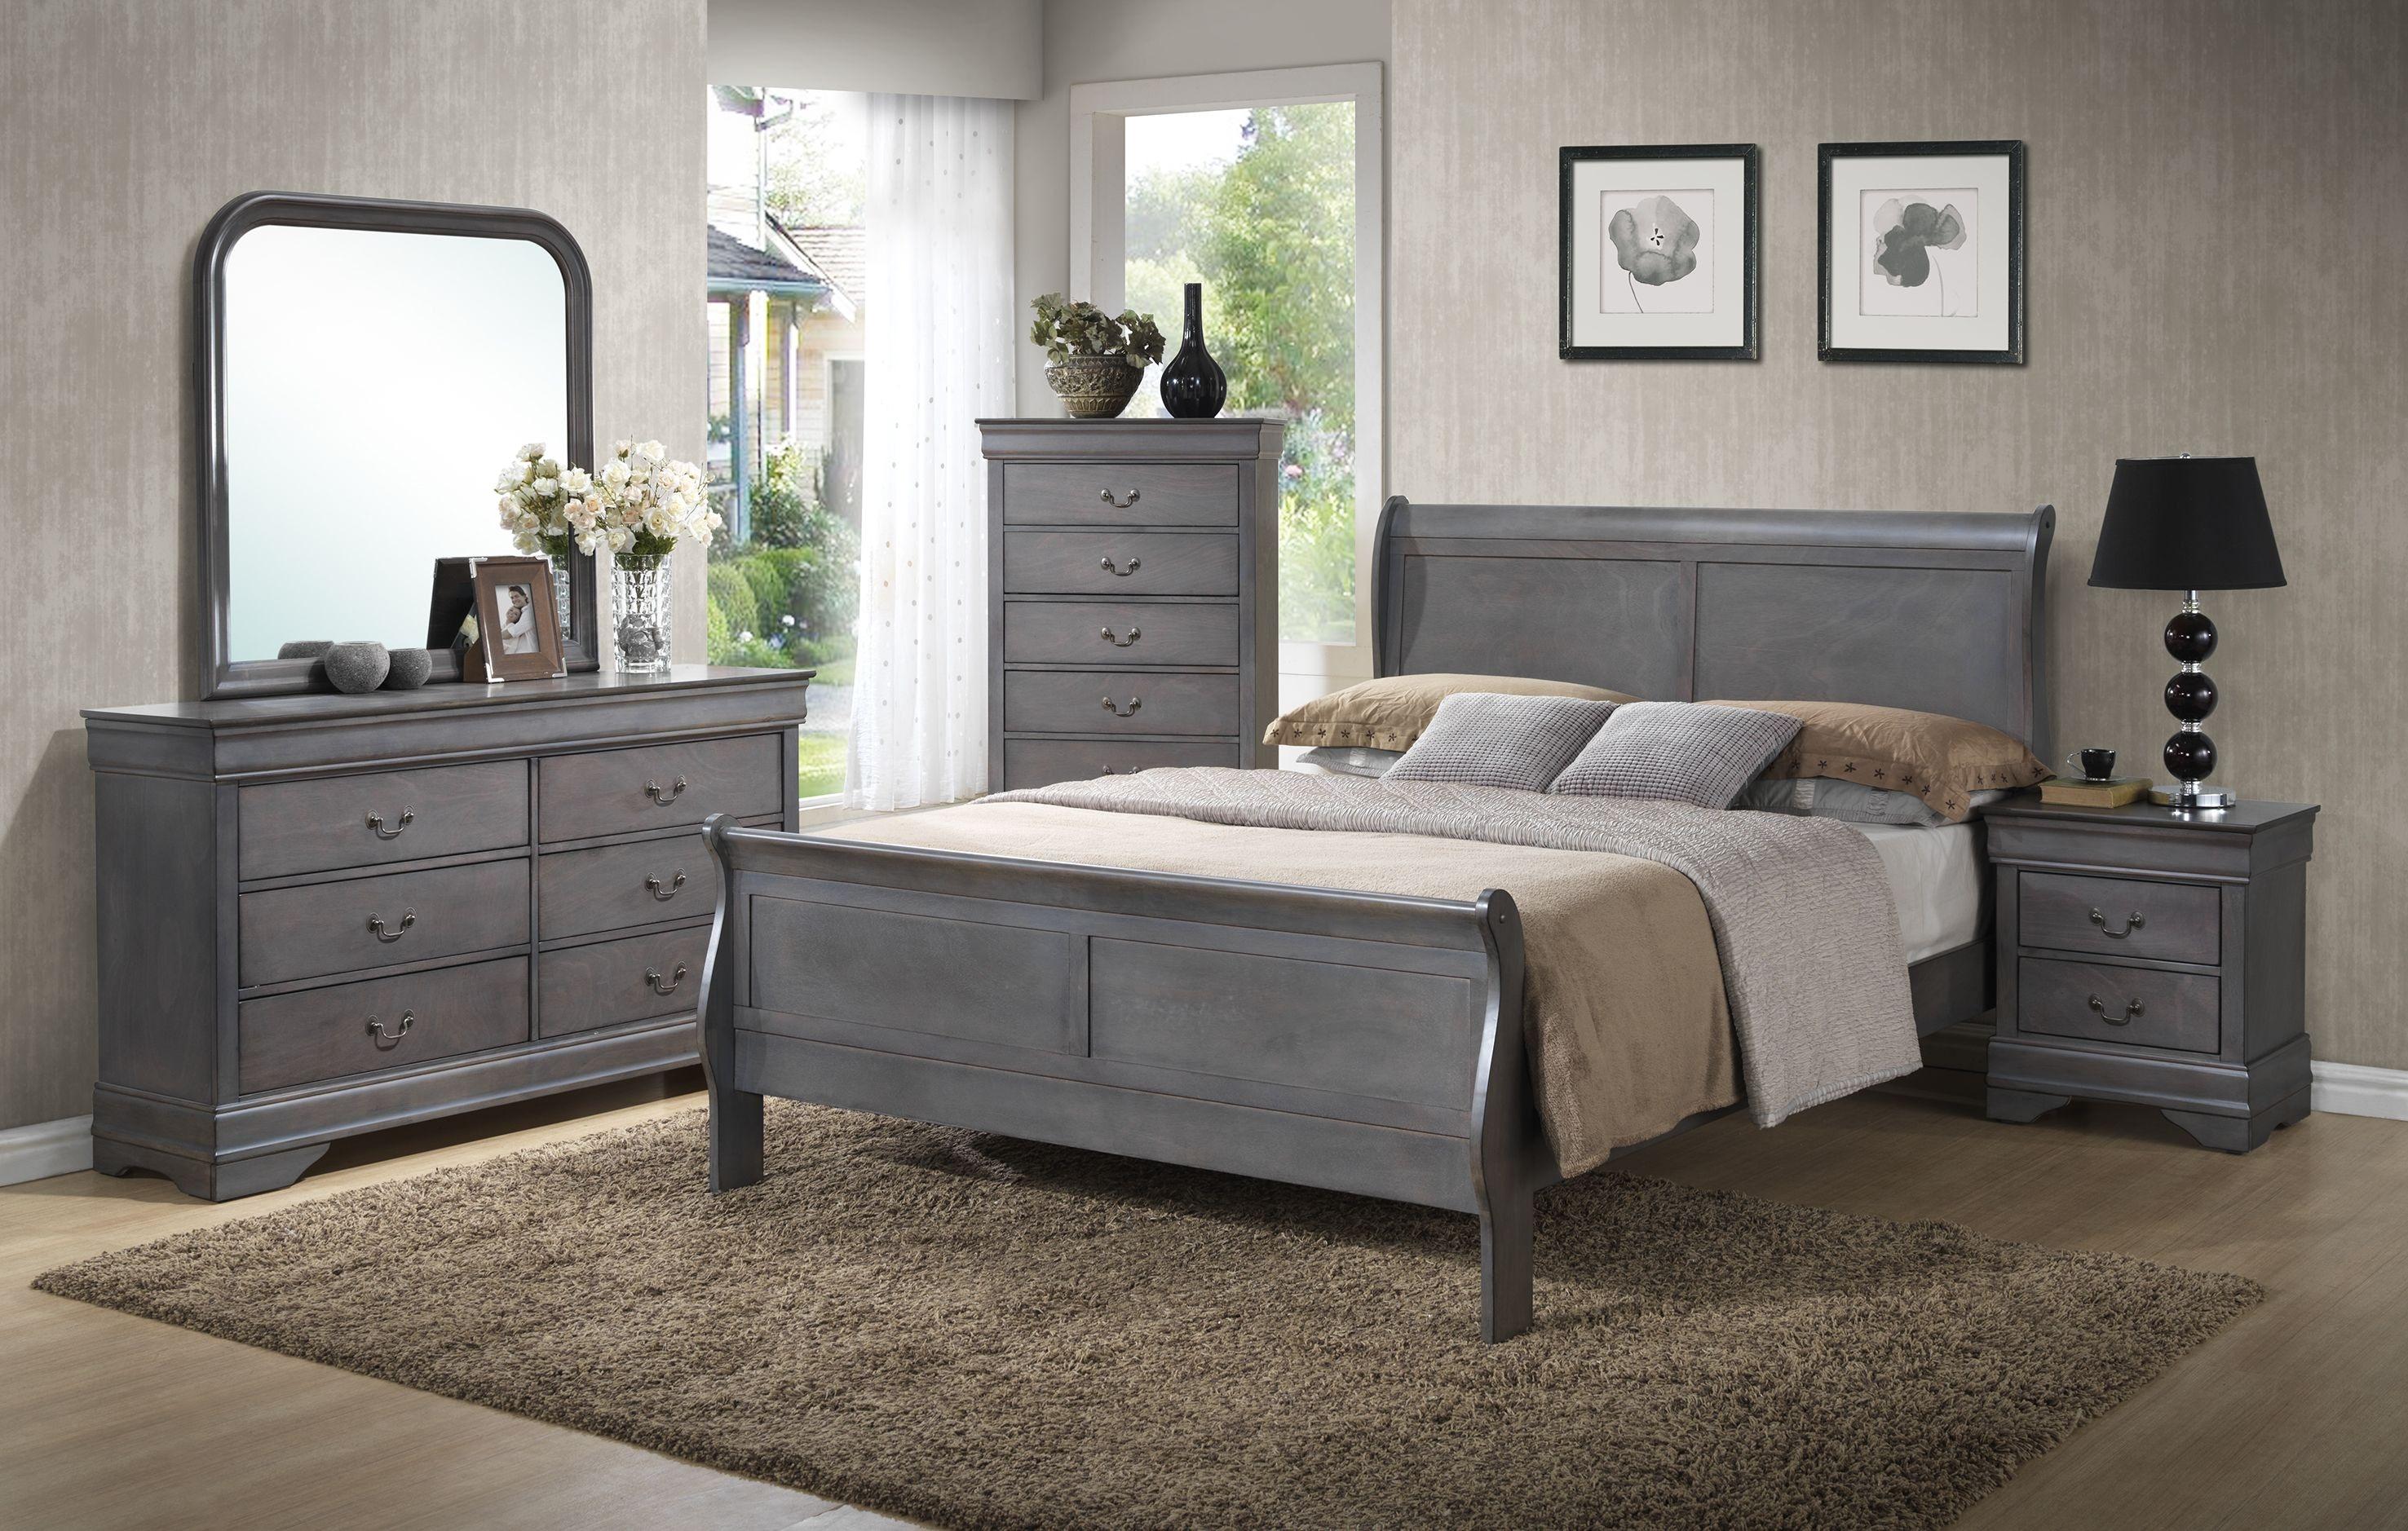 Lifestyle Dresser Mirror Chest Queen Sleigh Bed Set On Sale At